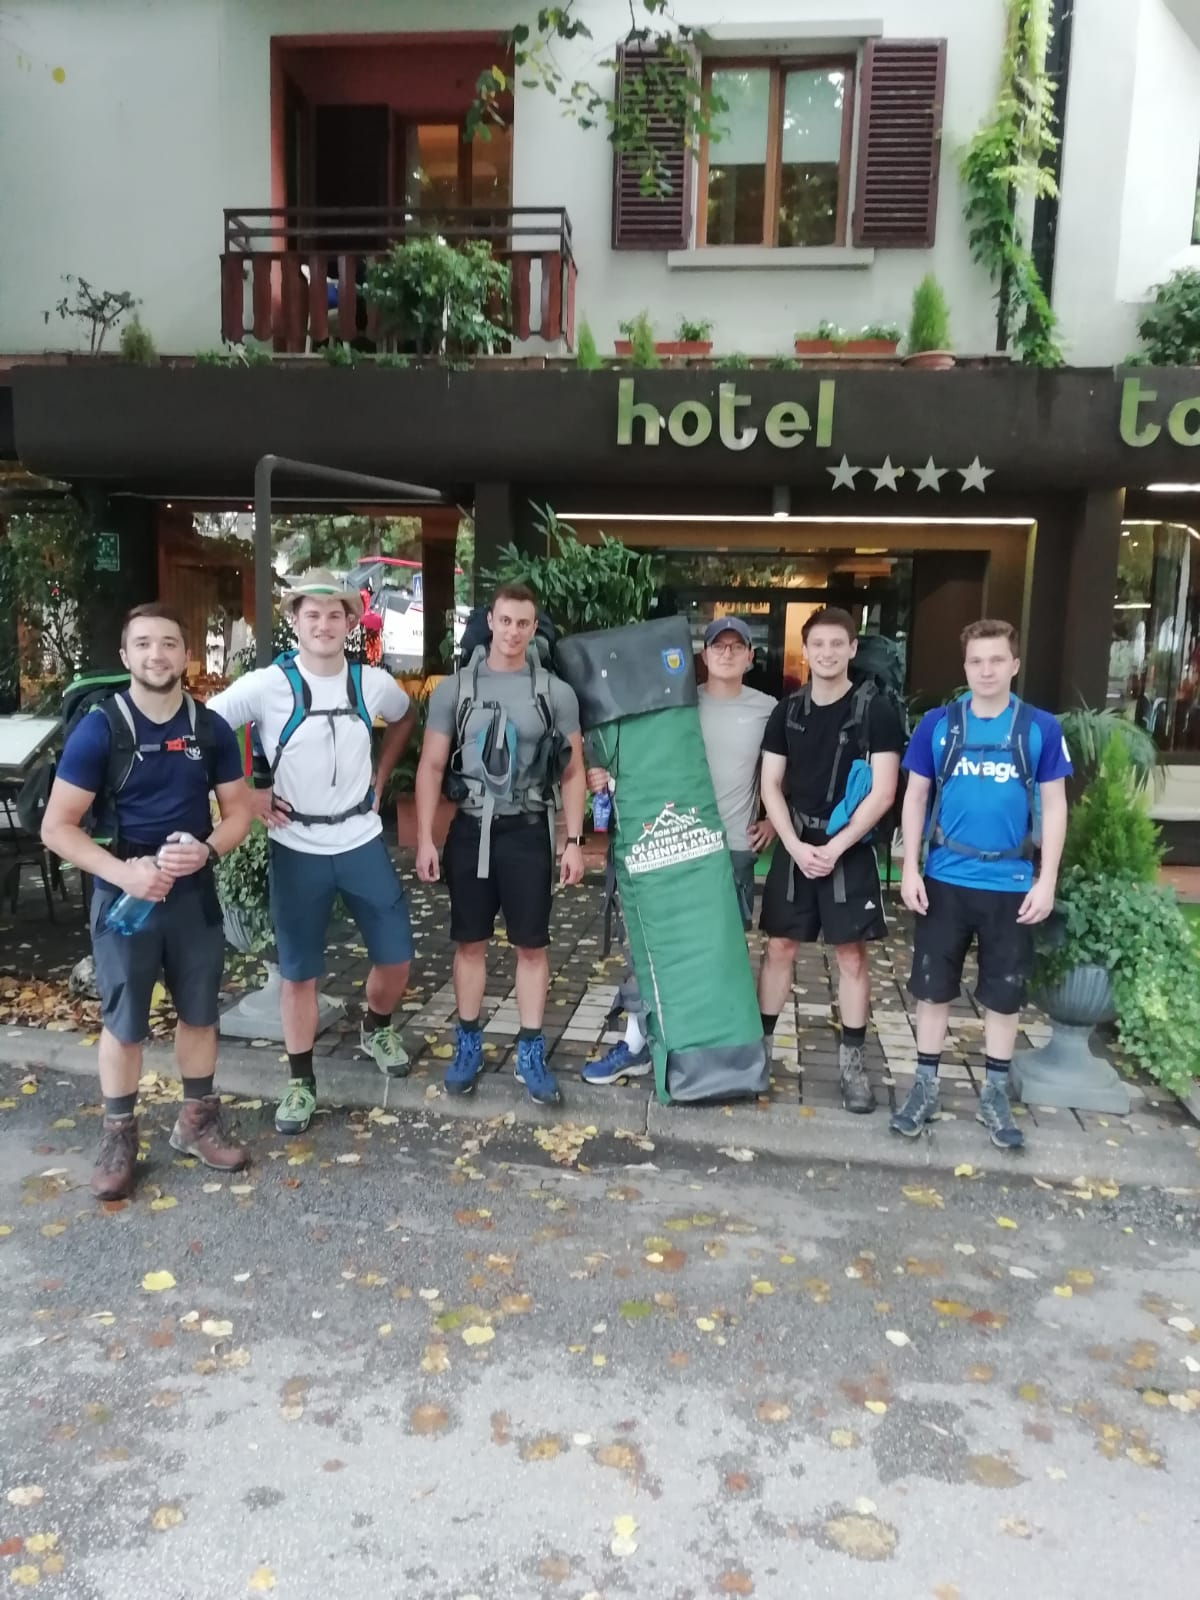 GSB- Tagebuch 24.09.19 – Il Chaotico: Zum Abschluss mal 'ne Bergetappe!